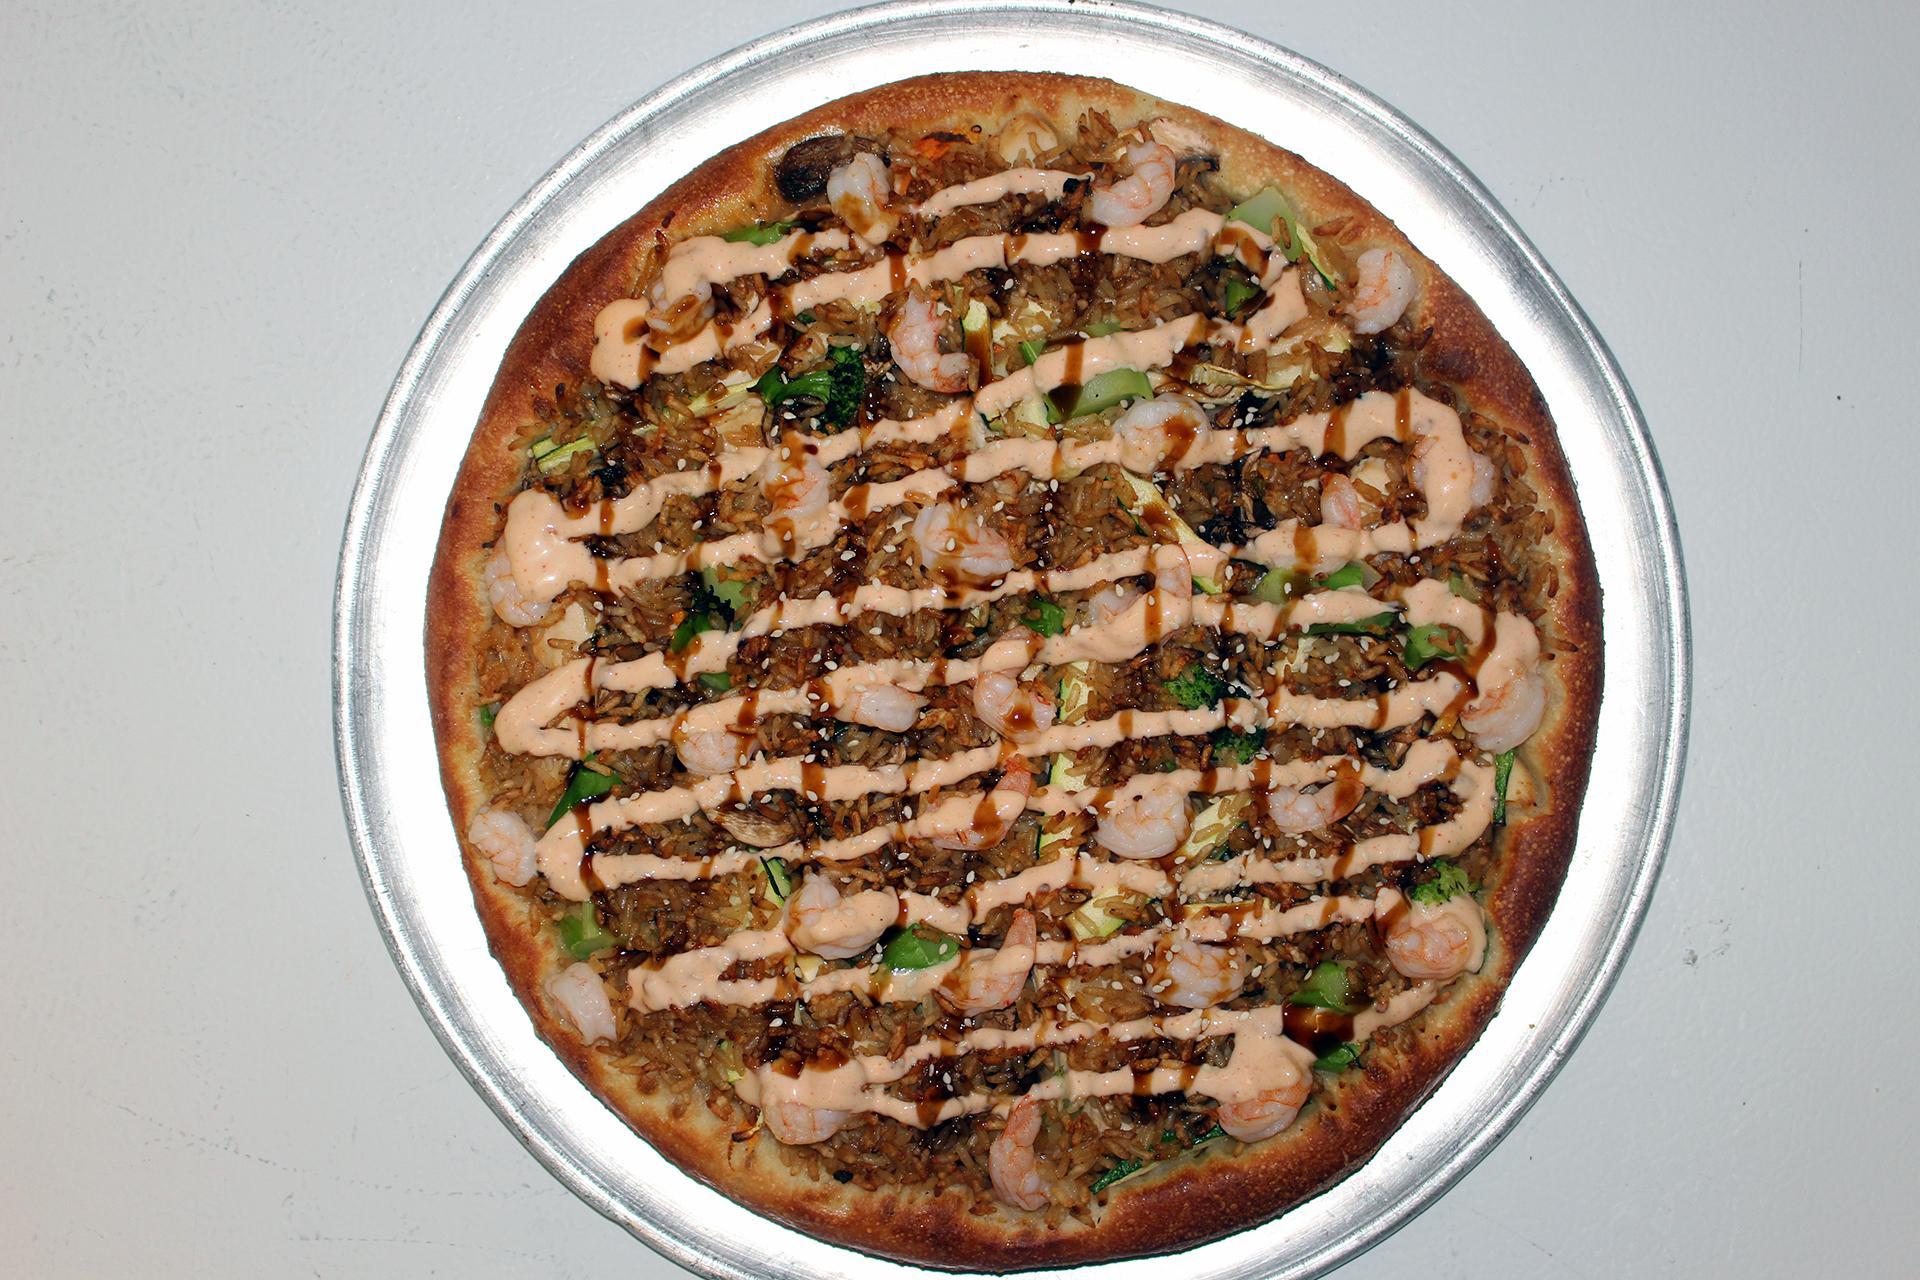 Image of The Hibachi Pizza